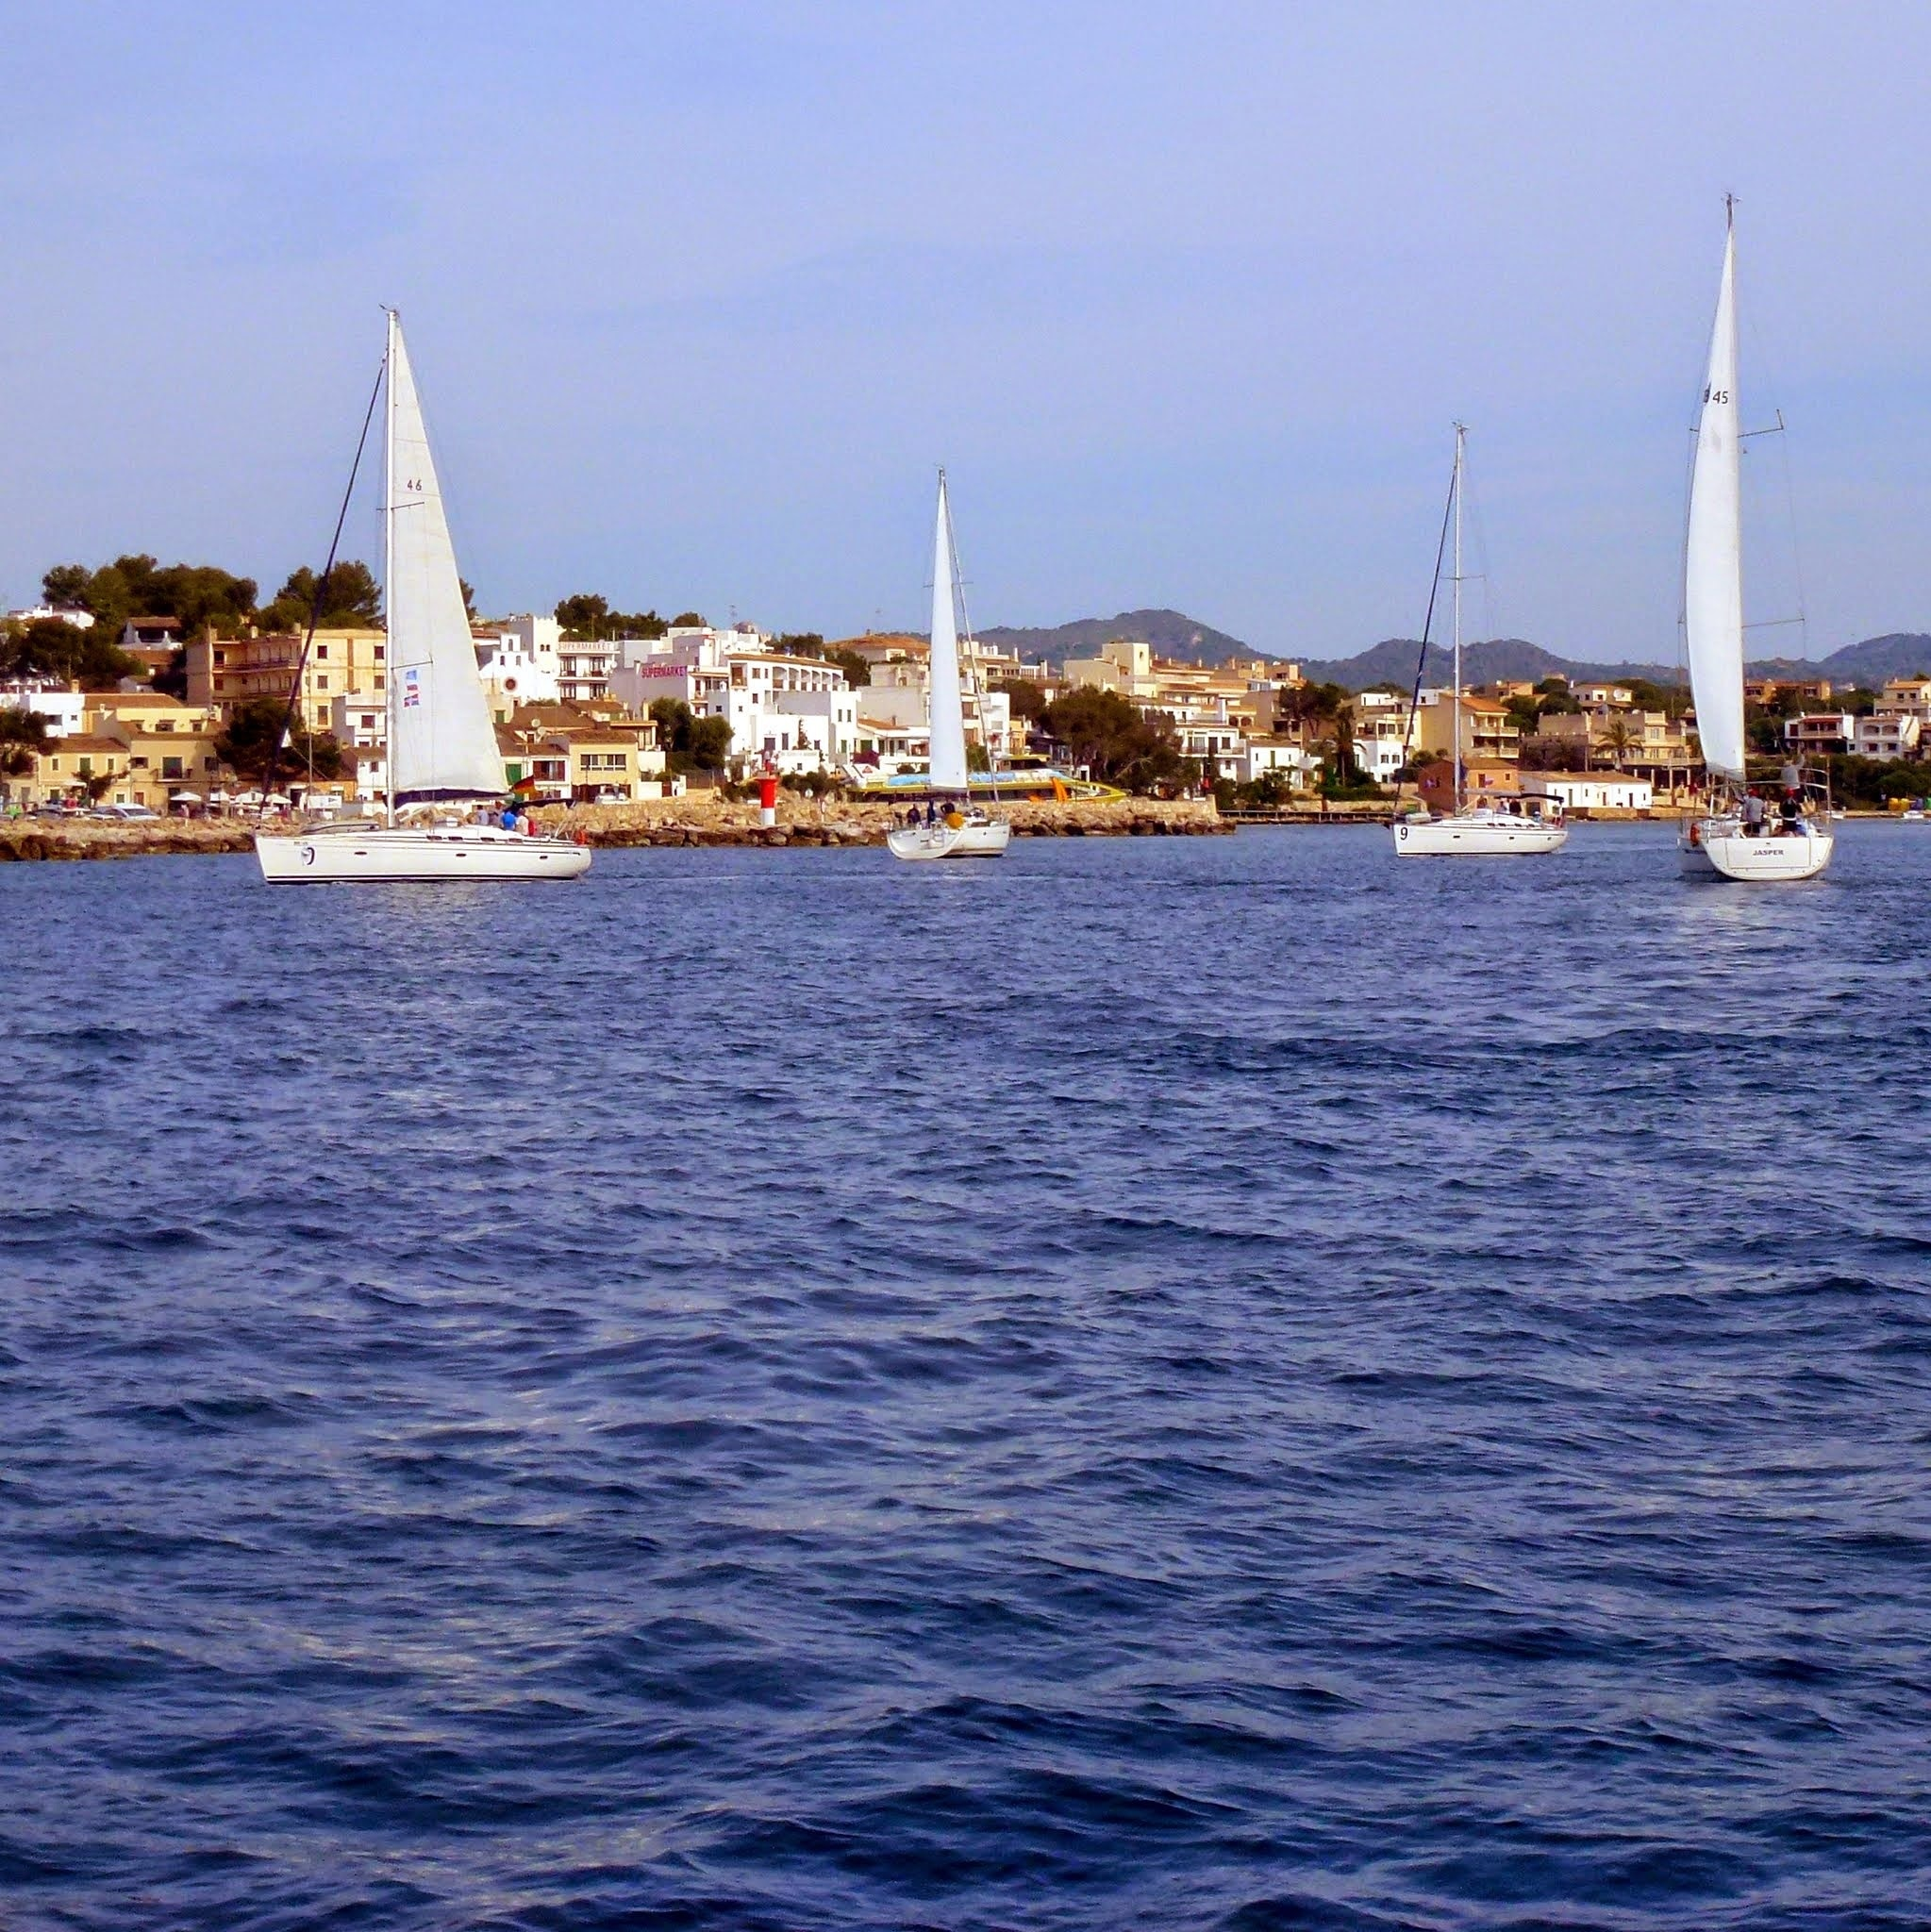 Portopetro, Santanyi, Balearic Islands, Spain